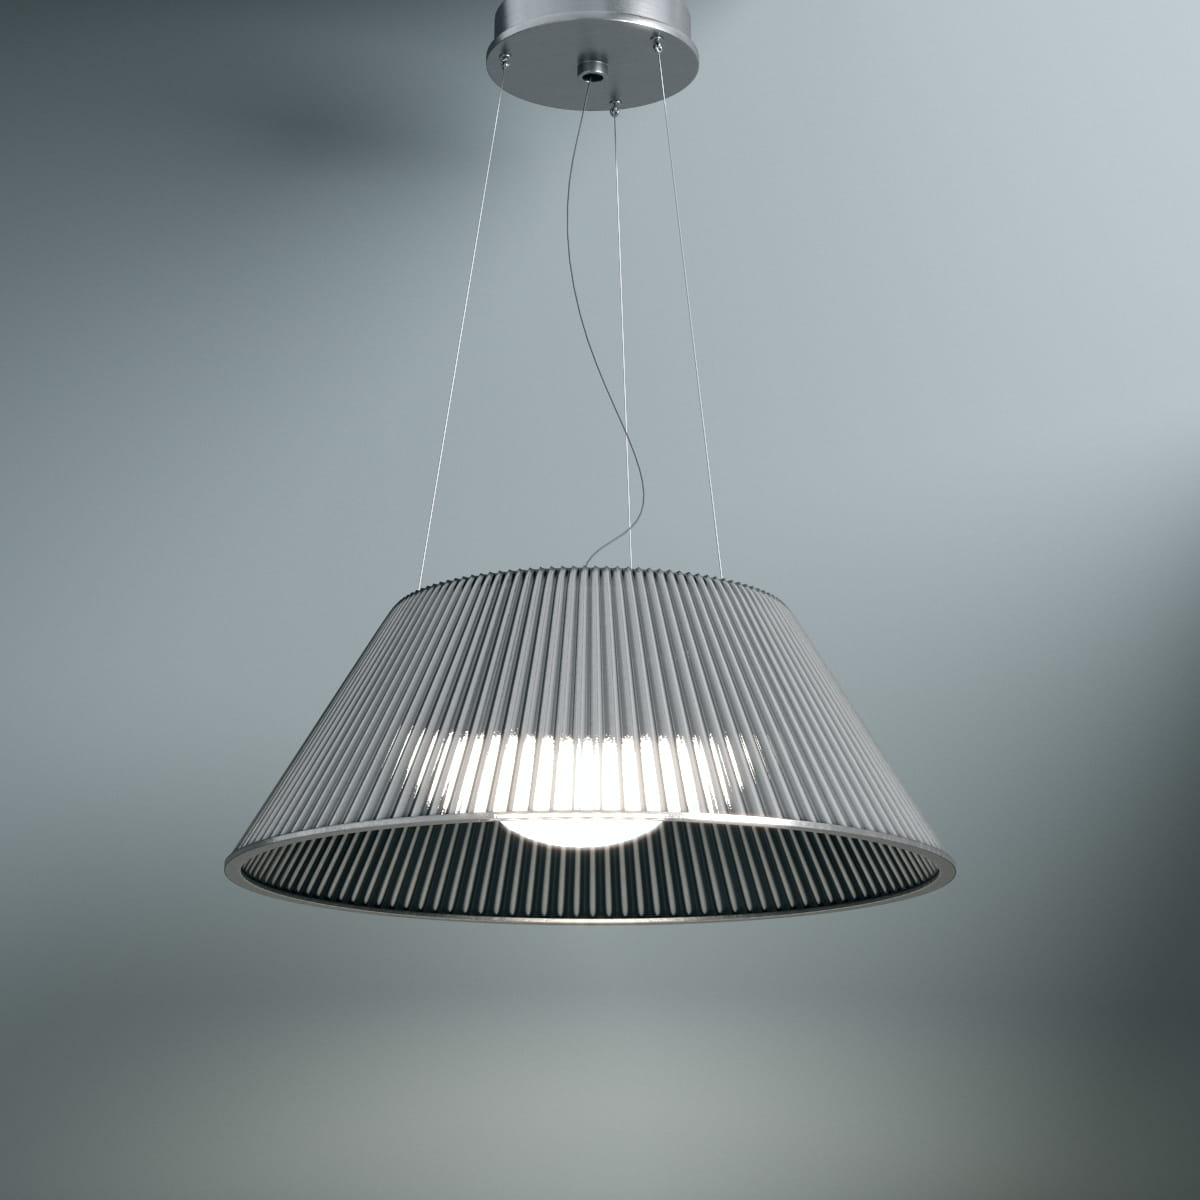 lamp 51 AM247